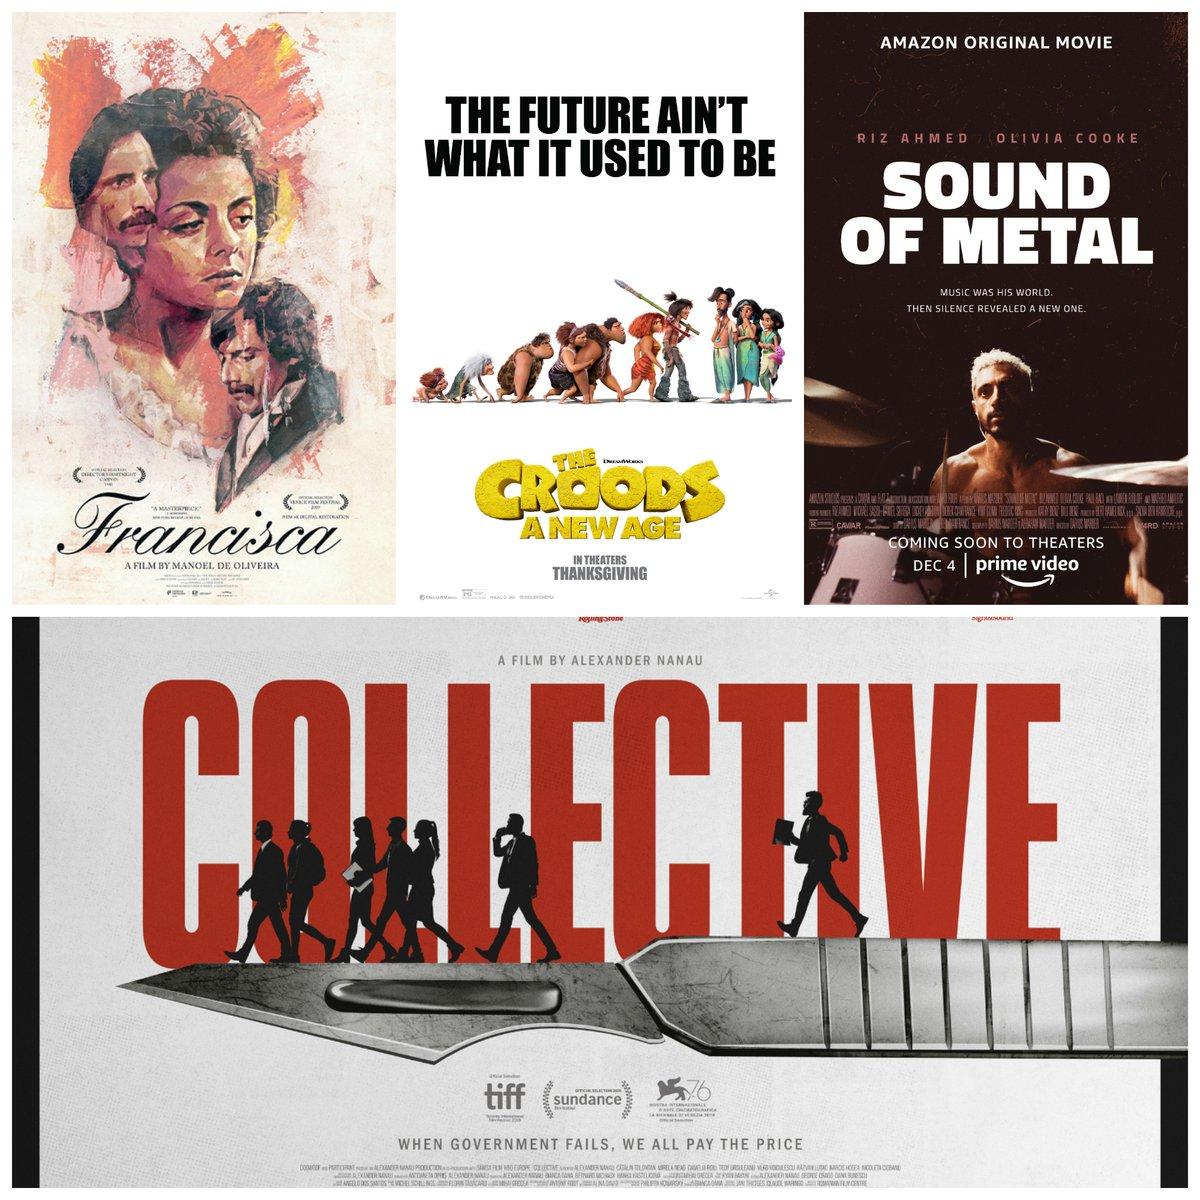 New episode!  #CroodsNewAge #SoundofMetal #CollectiveFilm #Francisca